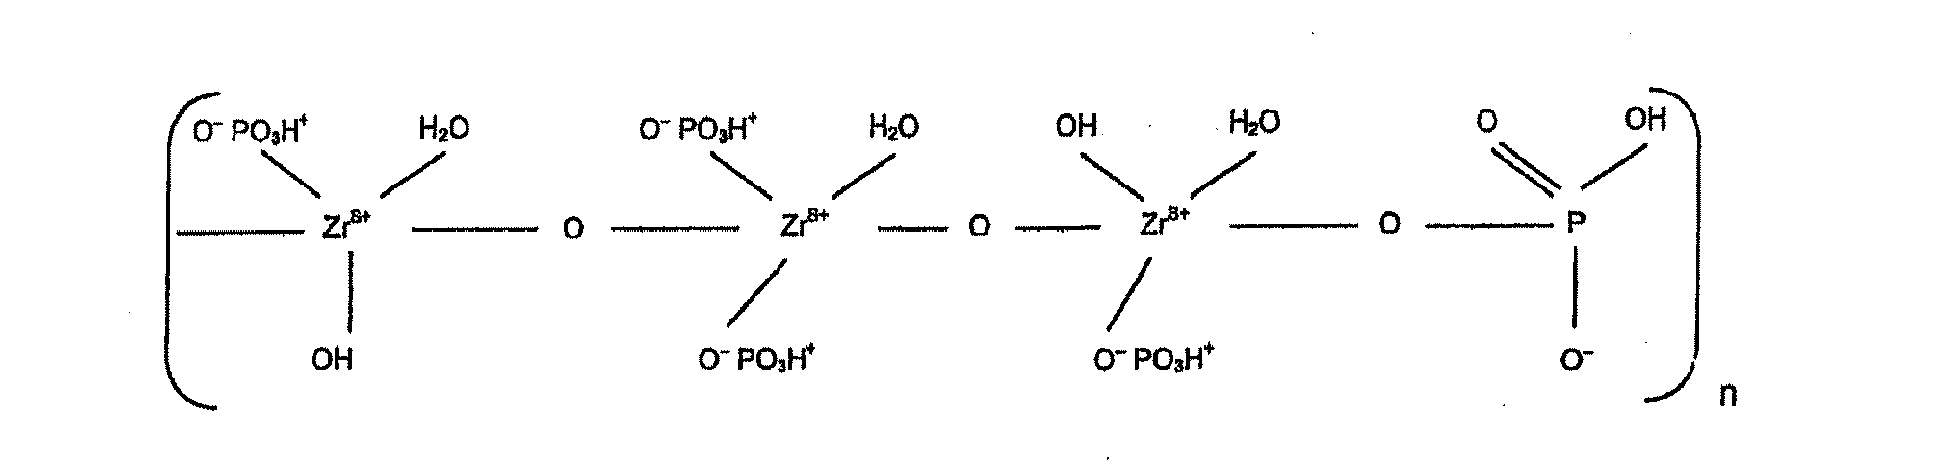 Zirconium Phosphate Physical Properties